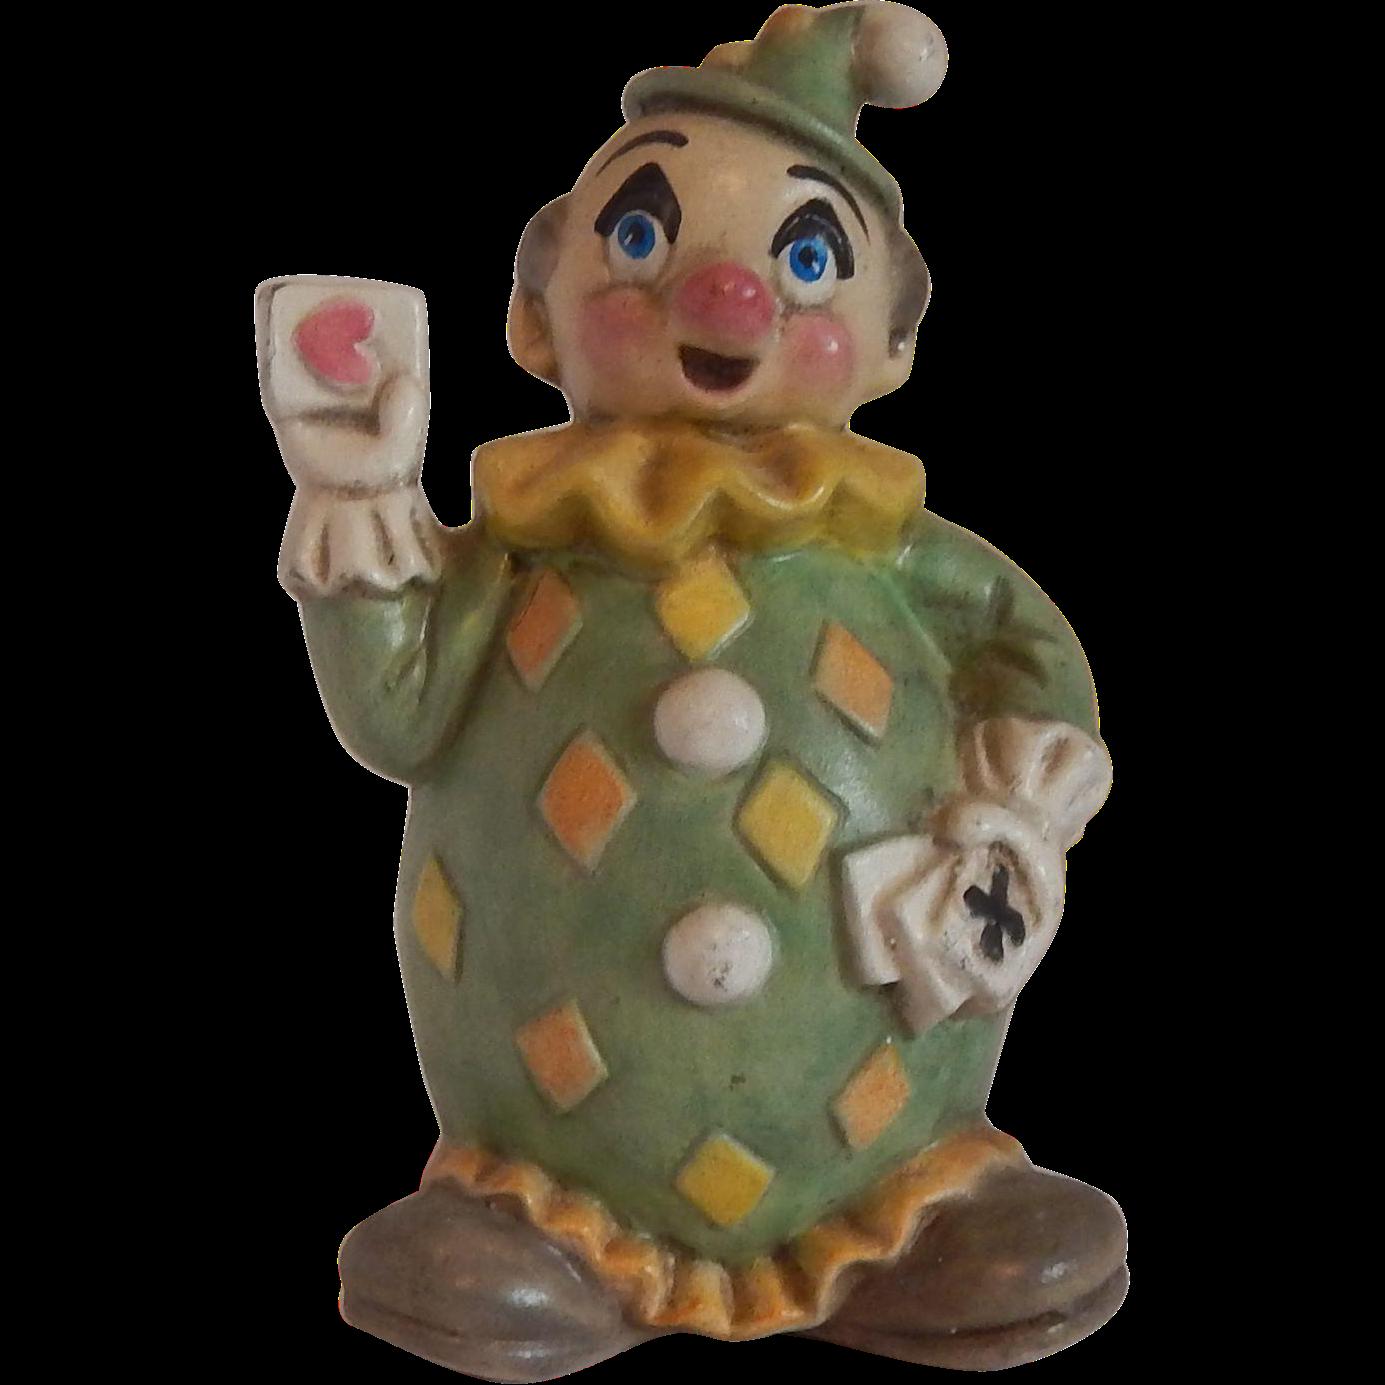 Hand Painted Ceramic Clown Figurine